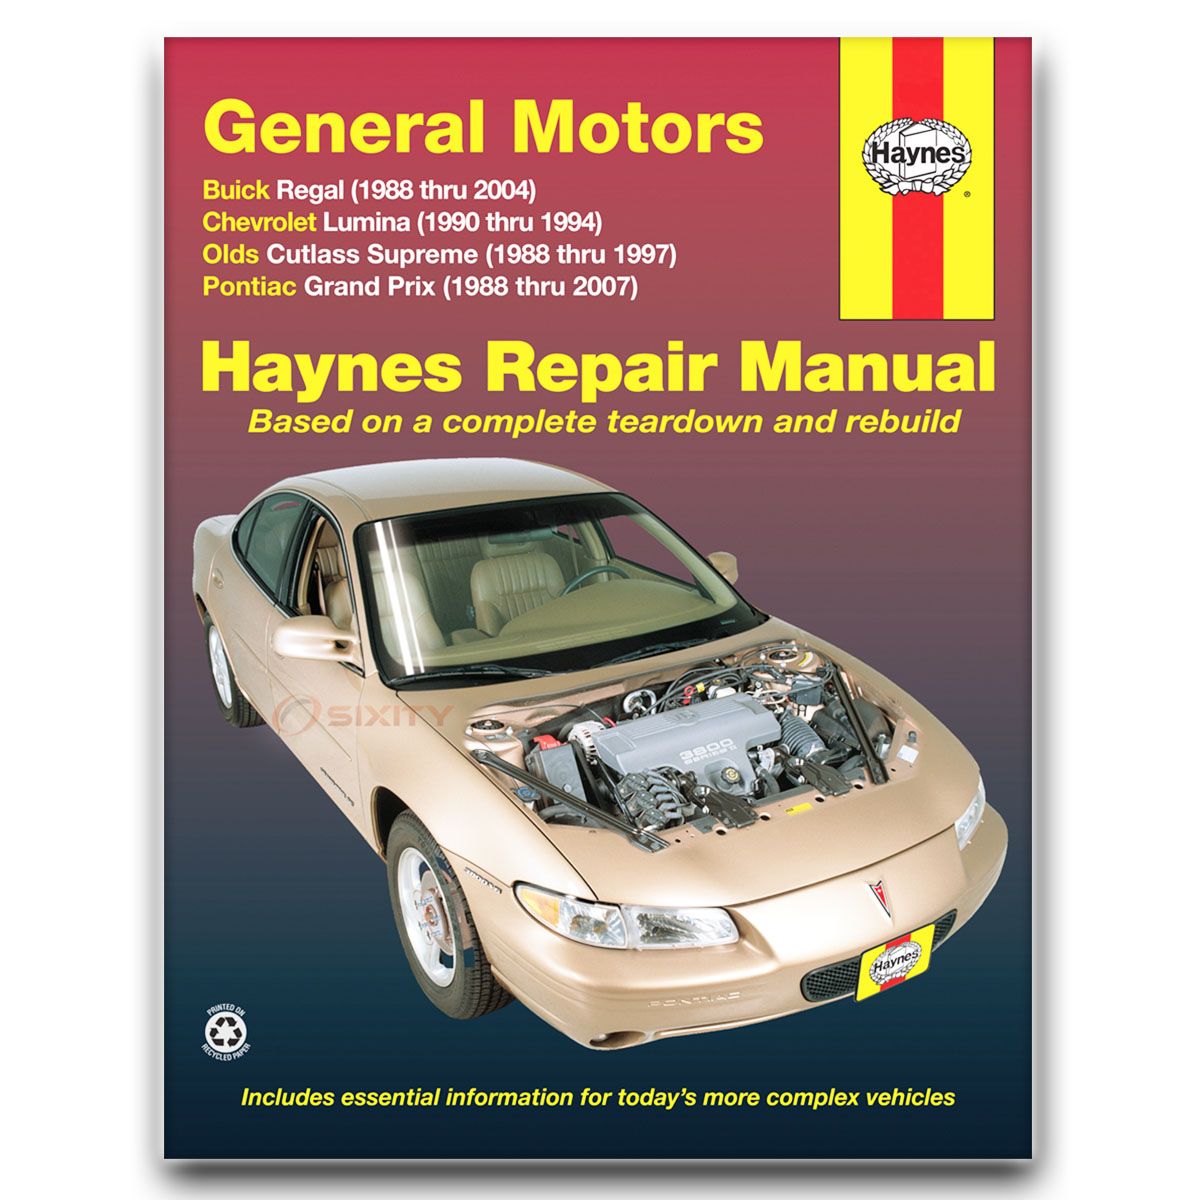 buick regal haynes repair manual lse base limited 25th anniversary rh ebay com 1981 Buick Regal Donk 1998 Buick Regal GS Supercharged